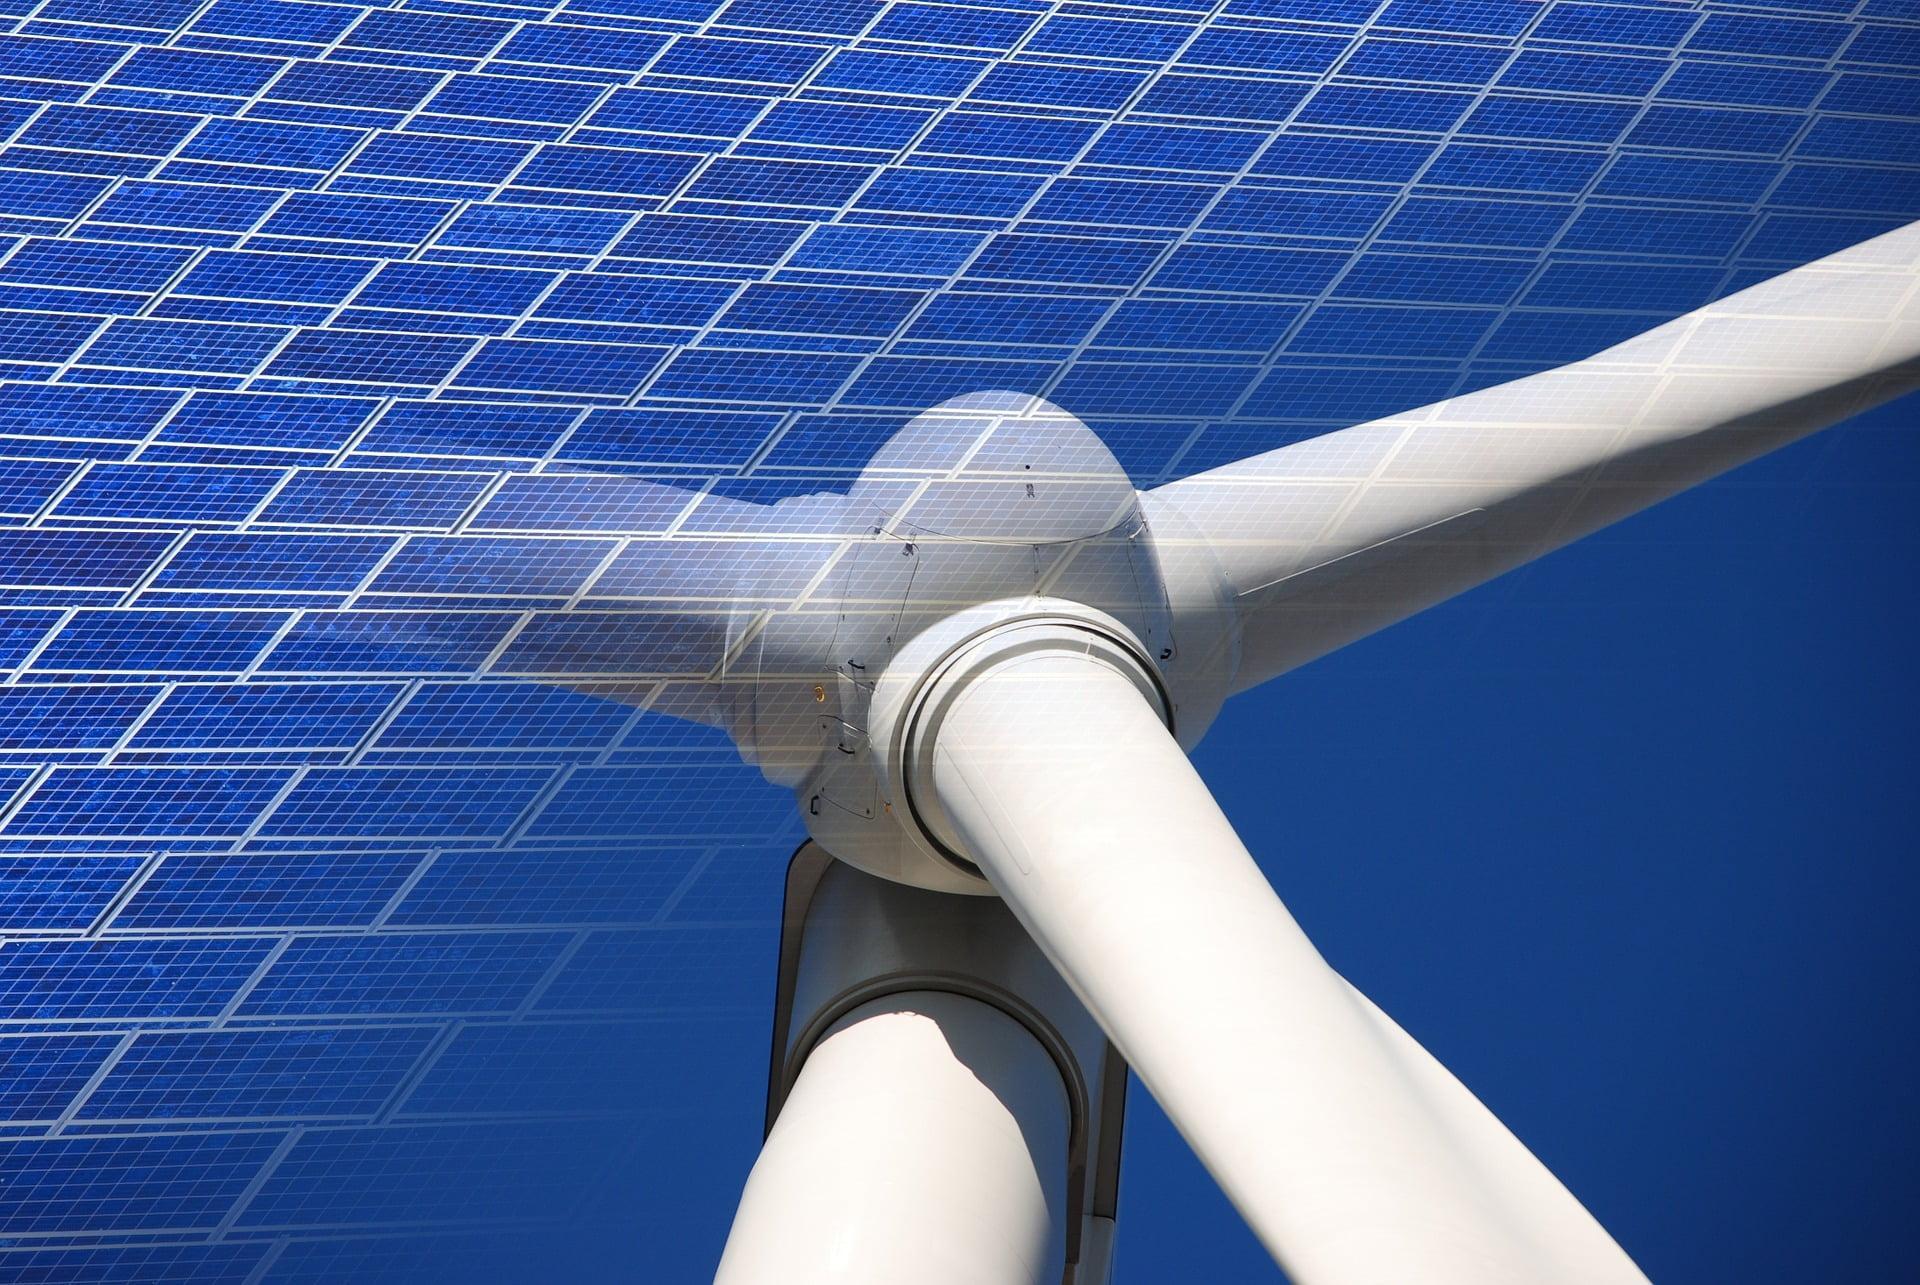 energetika projekt energy-1989341_1920